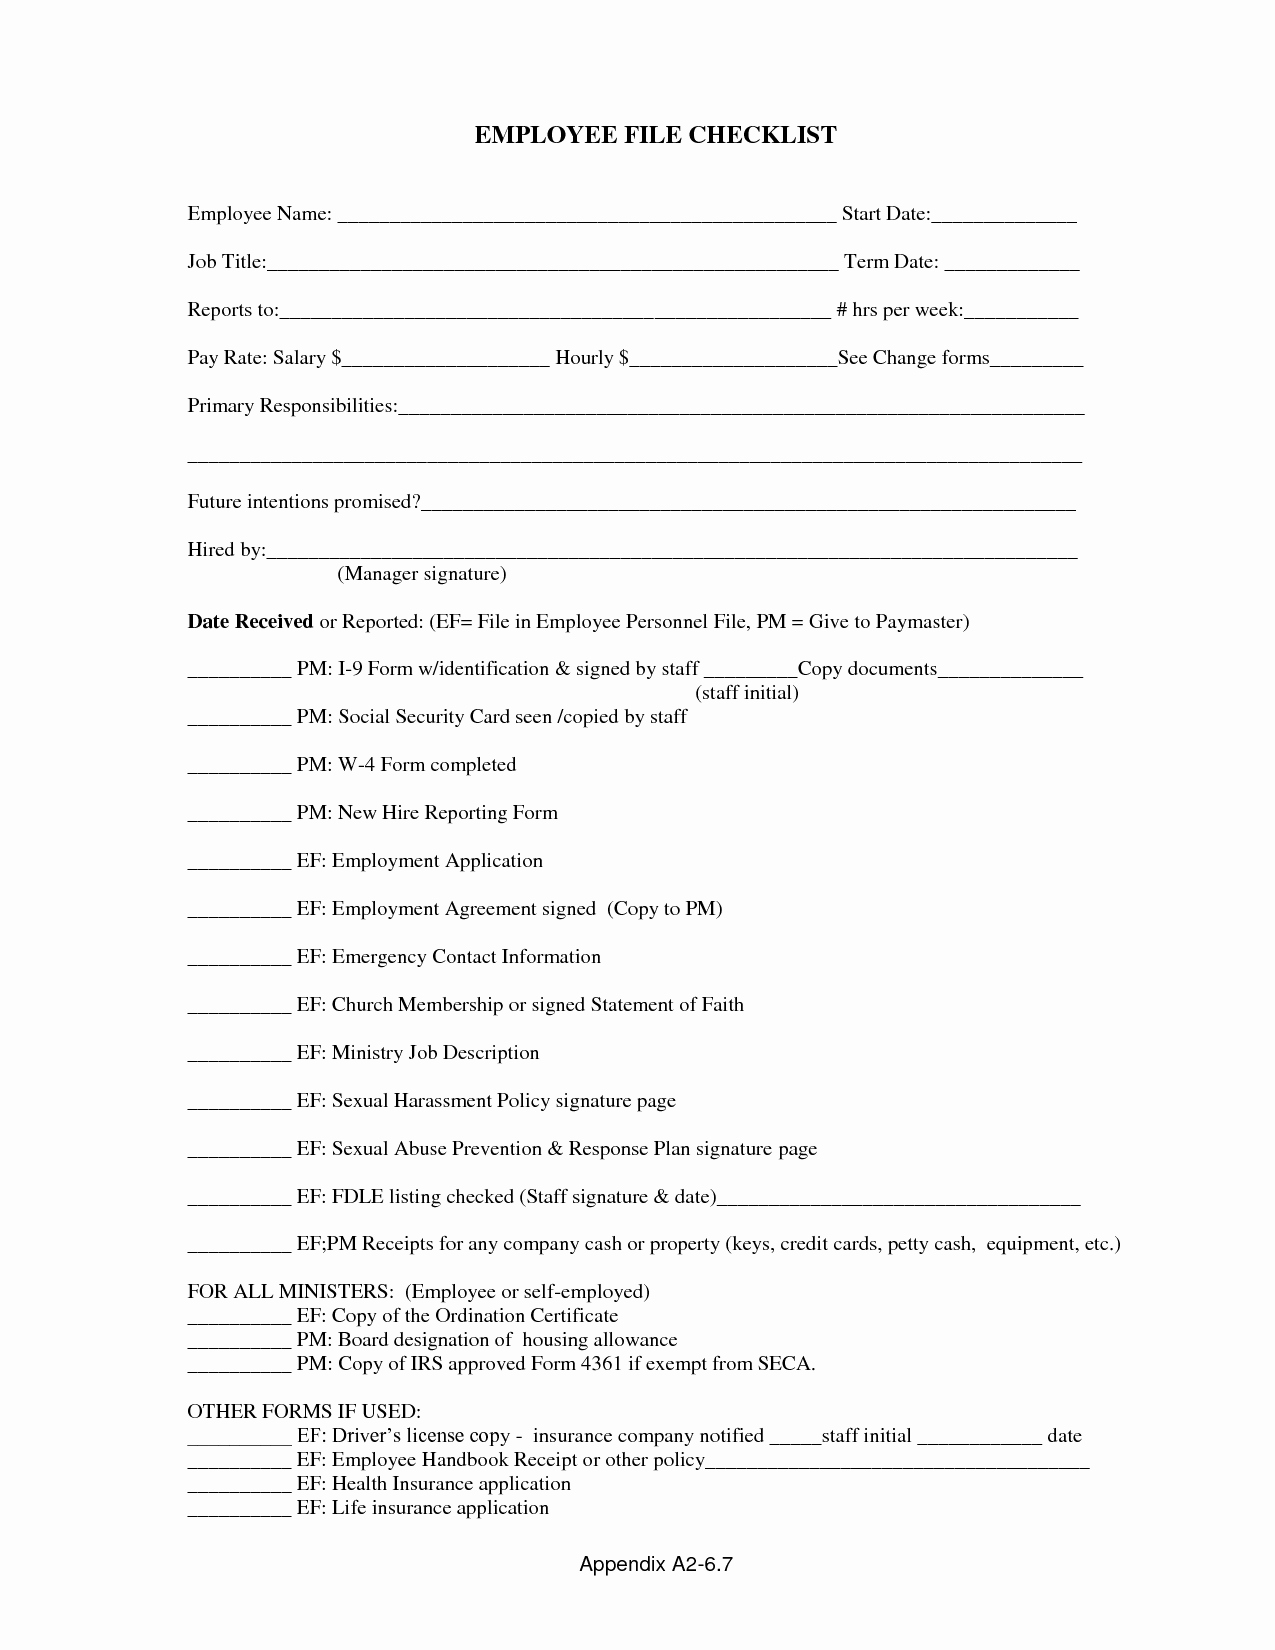 Personnel File Checklist Template New 15 Best Of Elementary Landform Worksheet 2nd